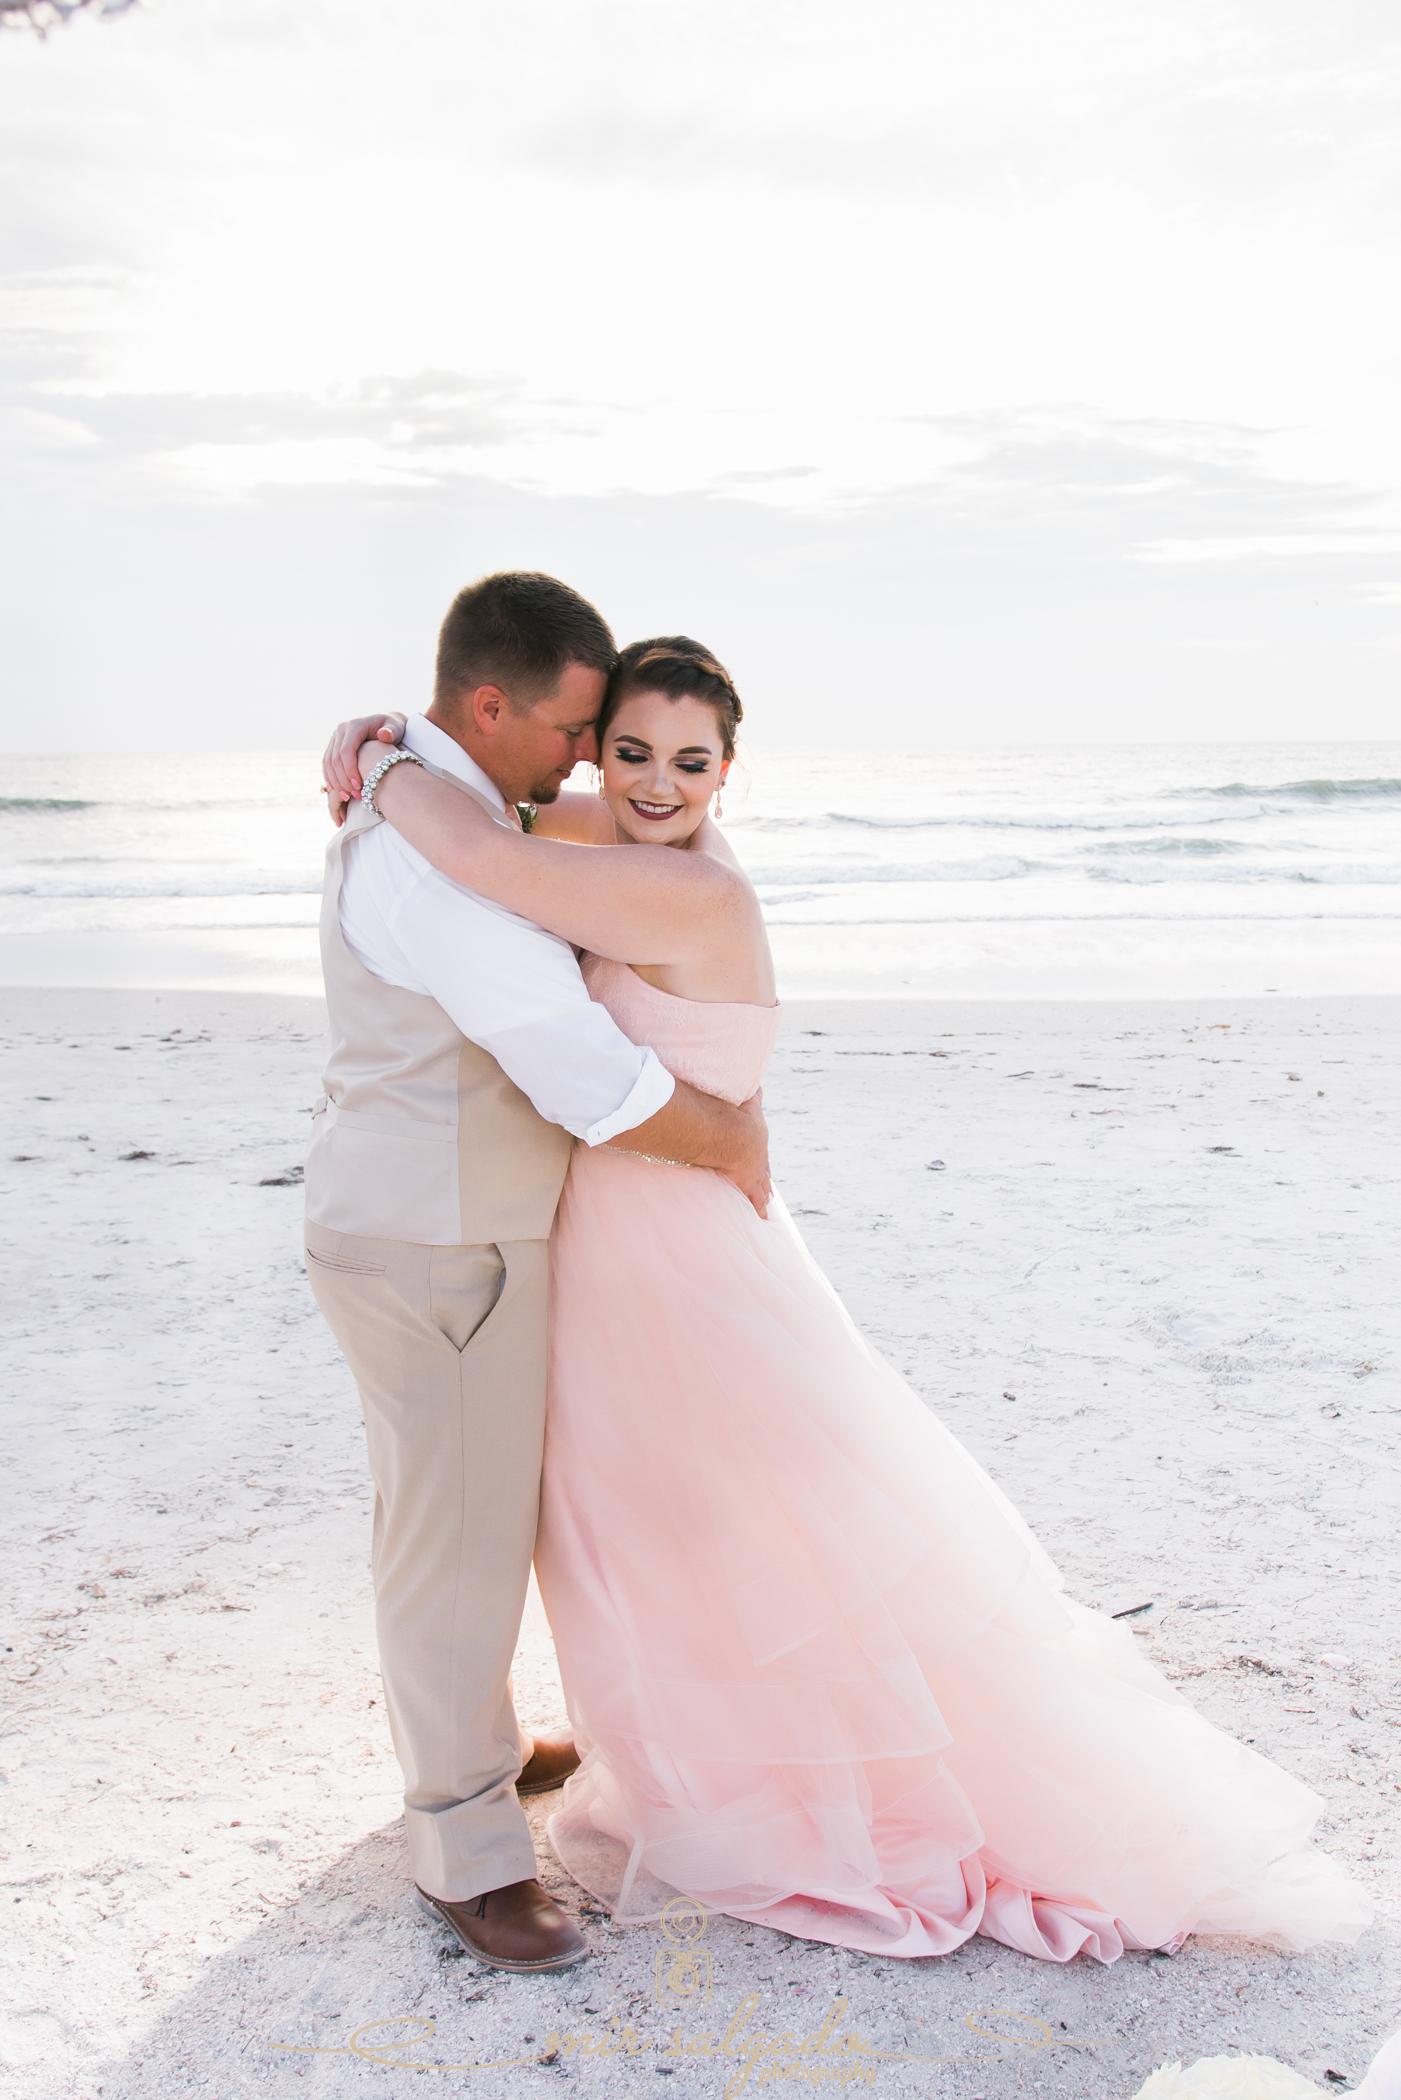 St.Pete-wedding-photographer, Florida-beach-wedding-photo